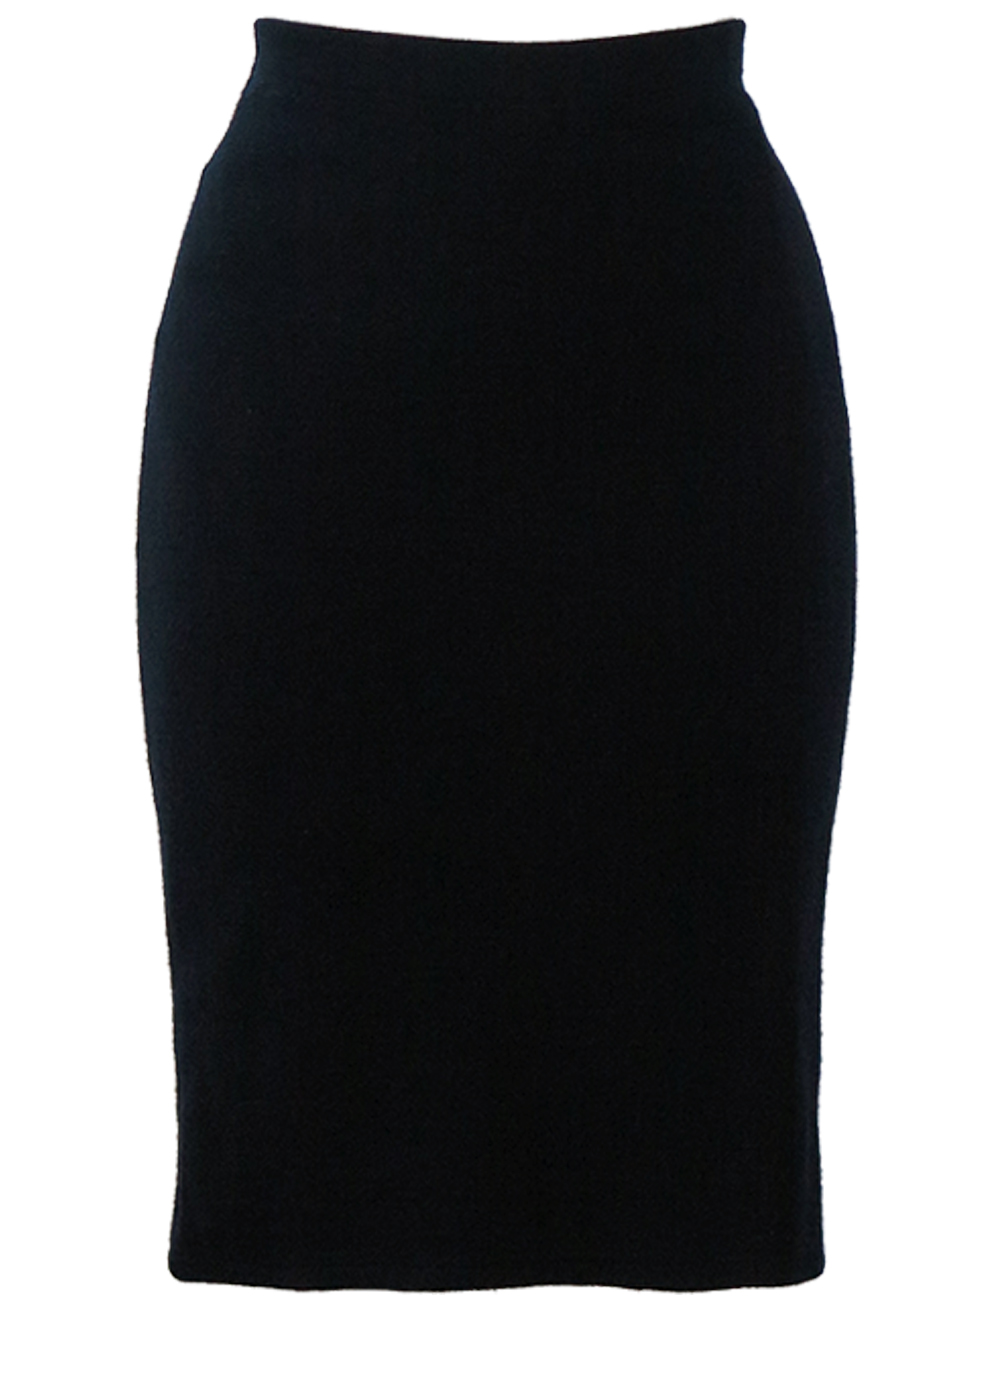 300e4f84b3 Navy Blue Jersey Knit Bodycon Pencil Skirt – S – Reign Vintage